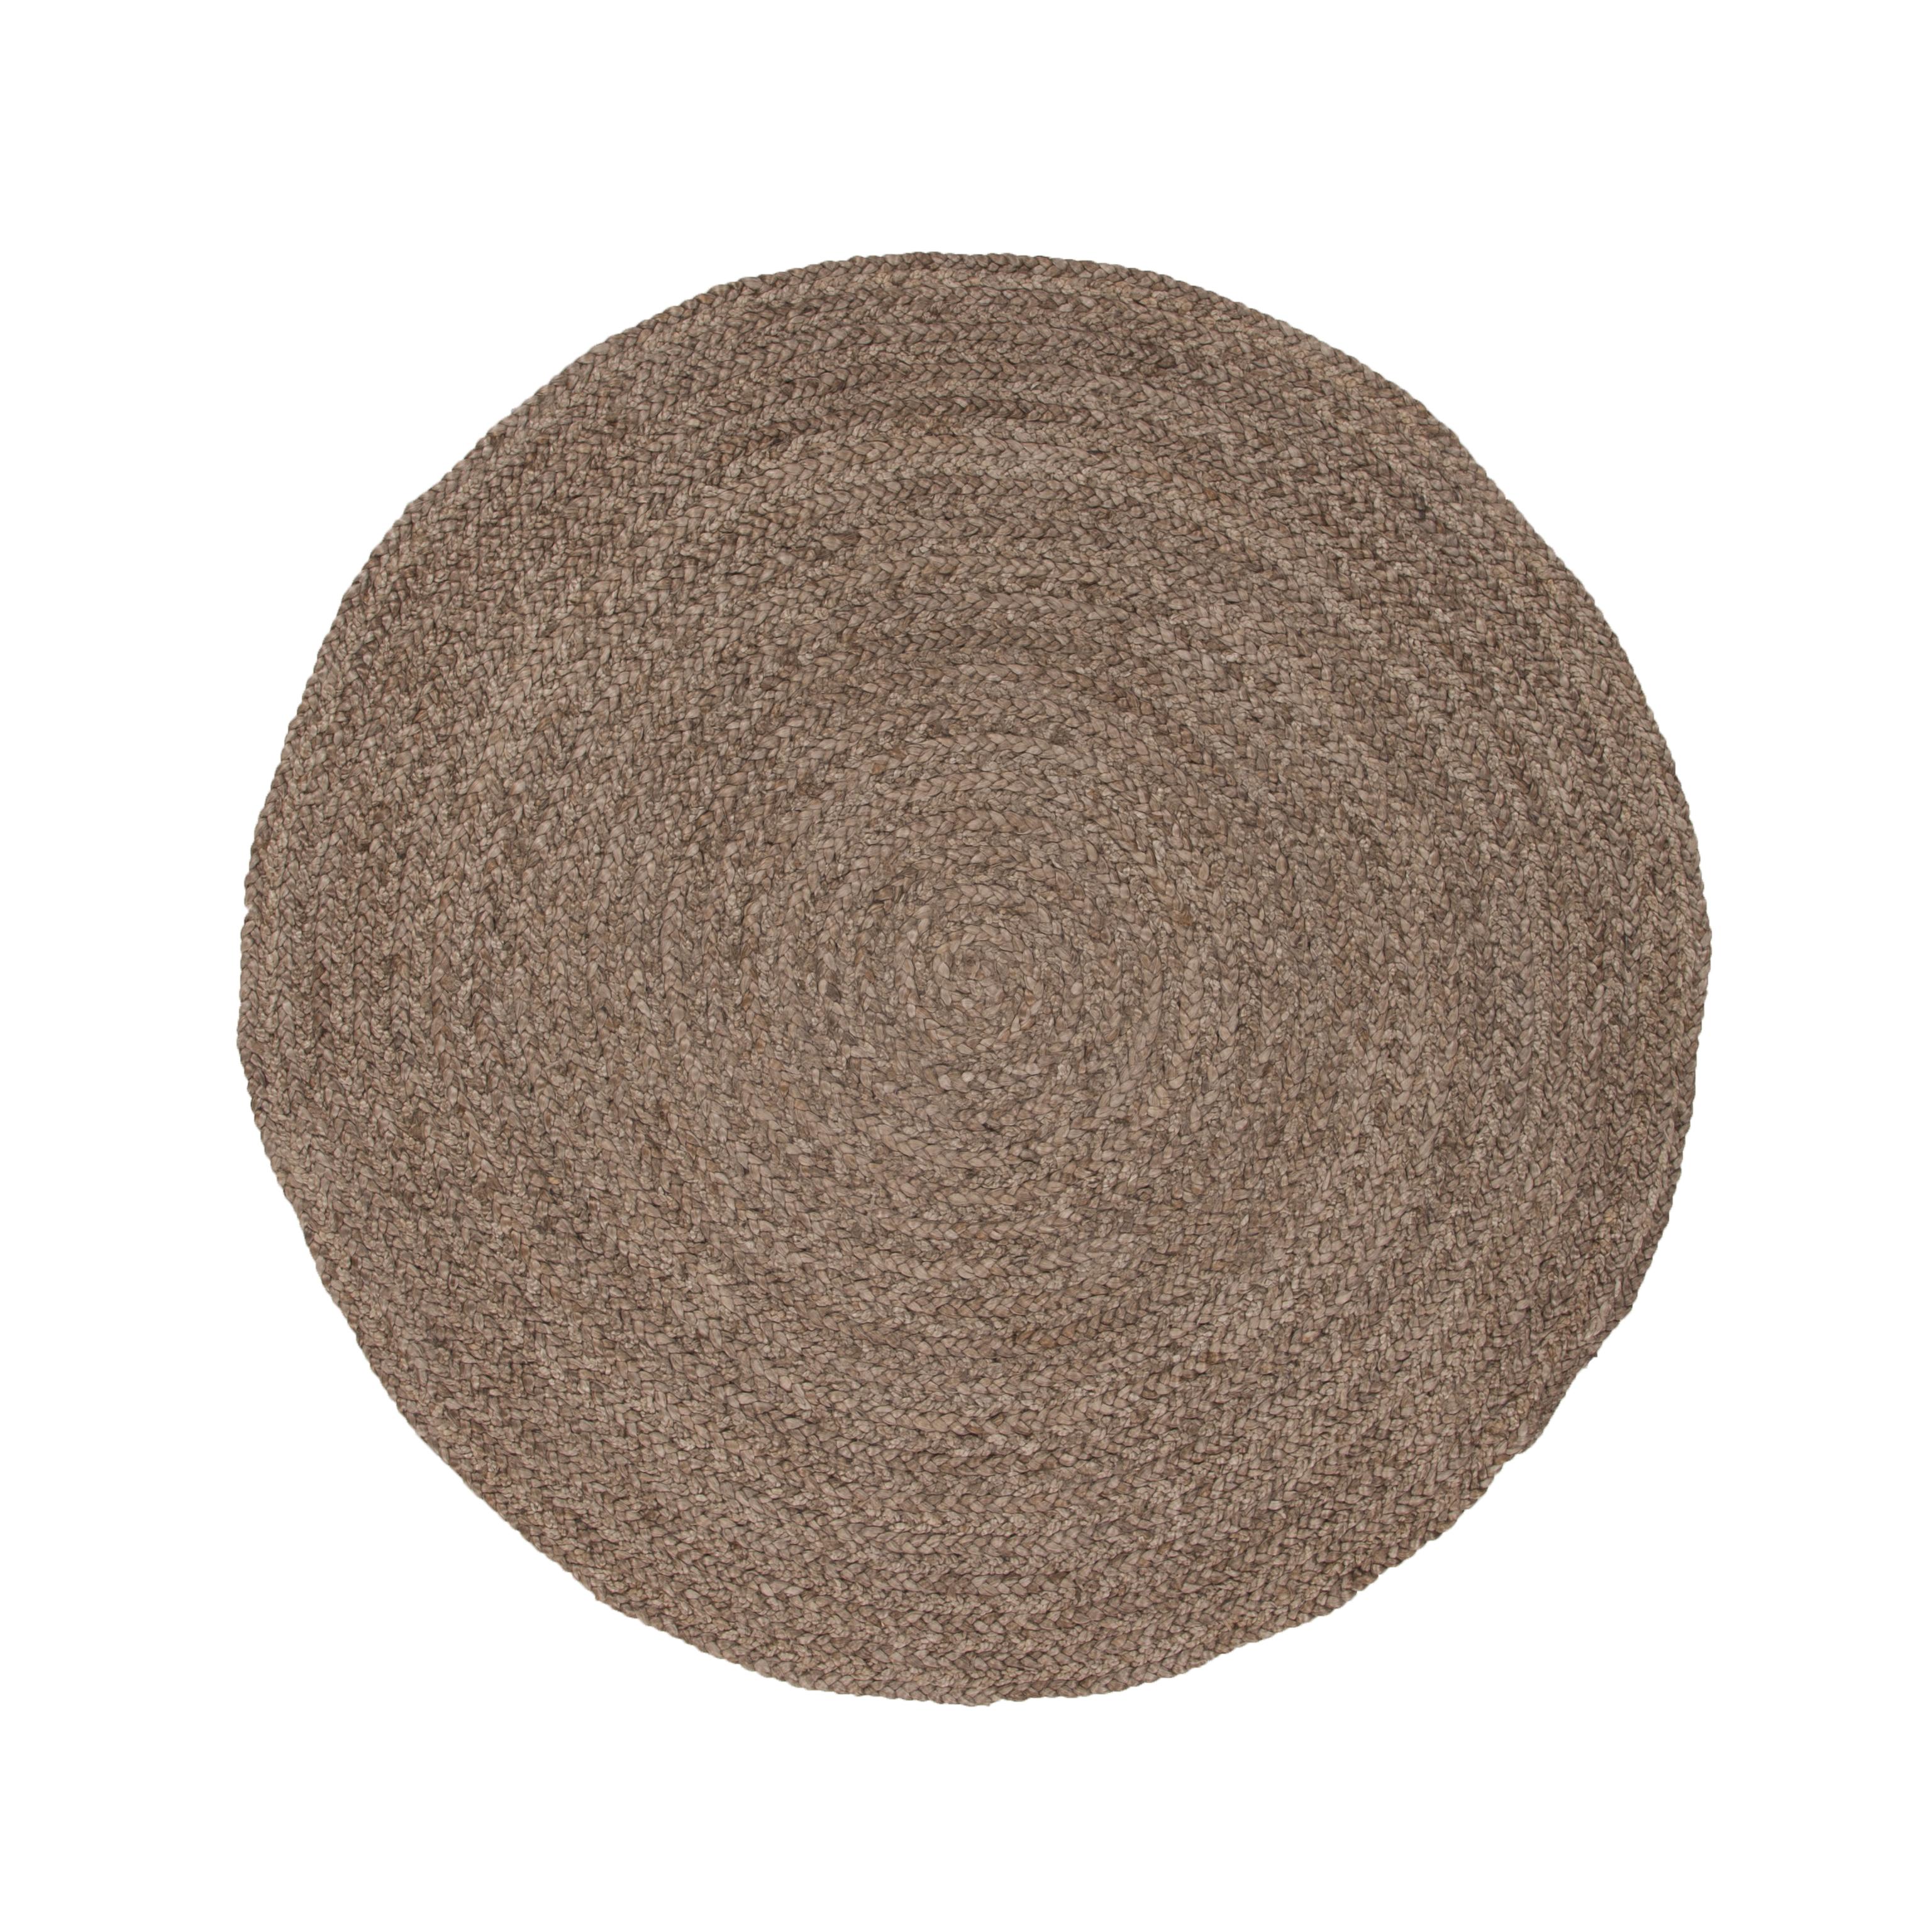 JAIPUR Rugs Spiral 6'RD Rug - Item Number: RUG120445